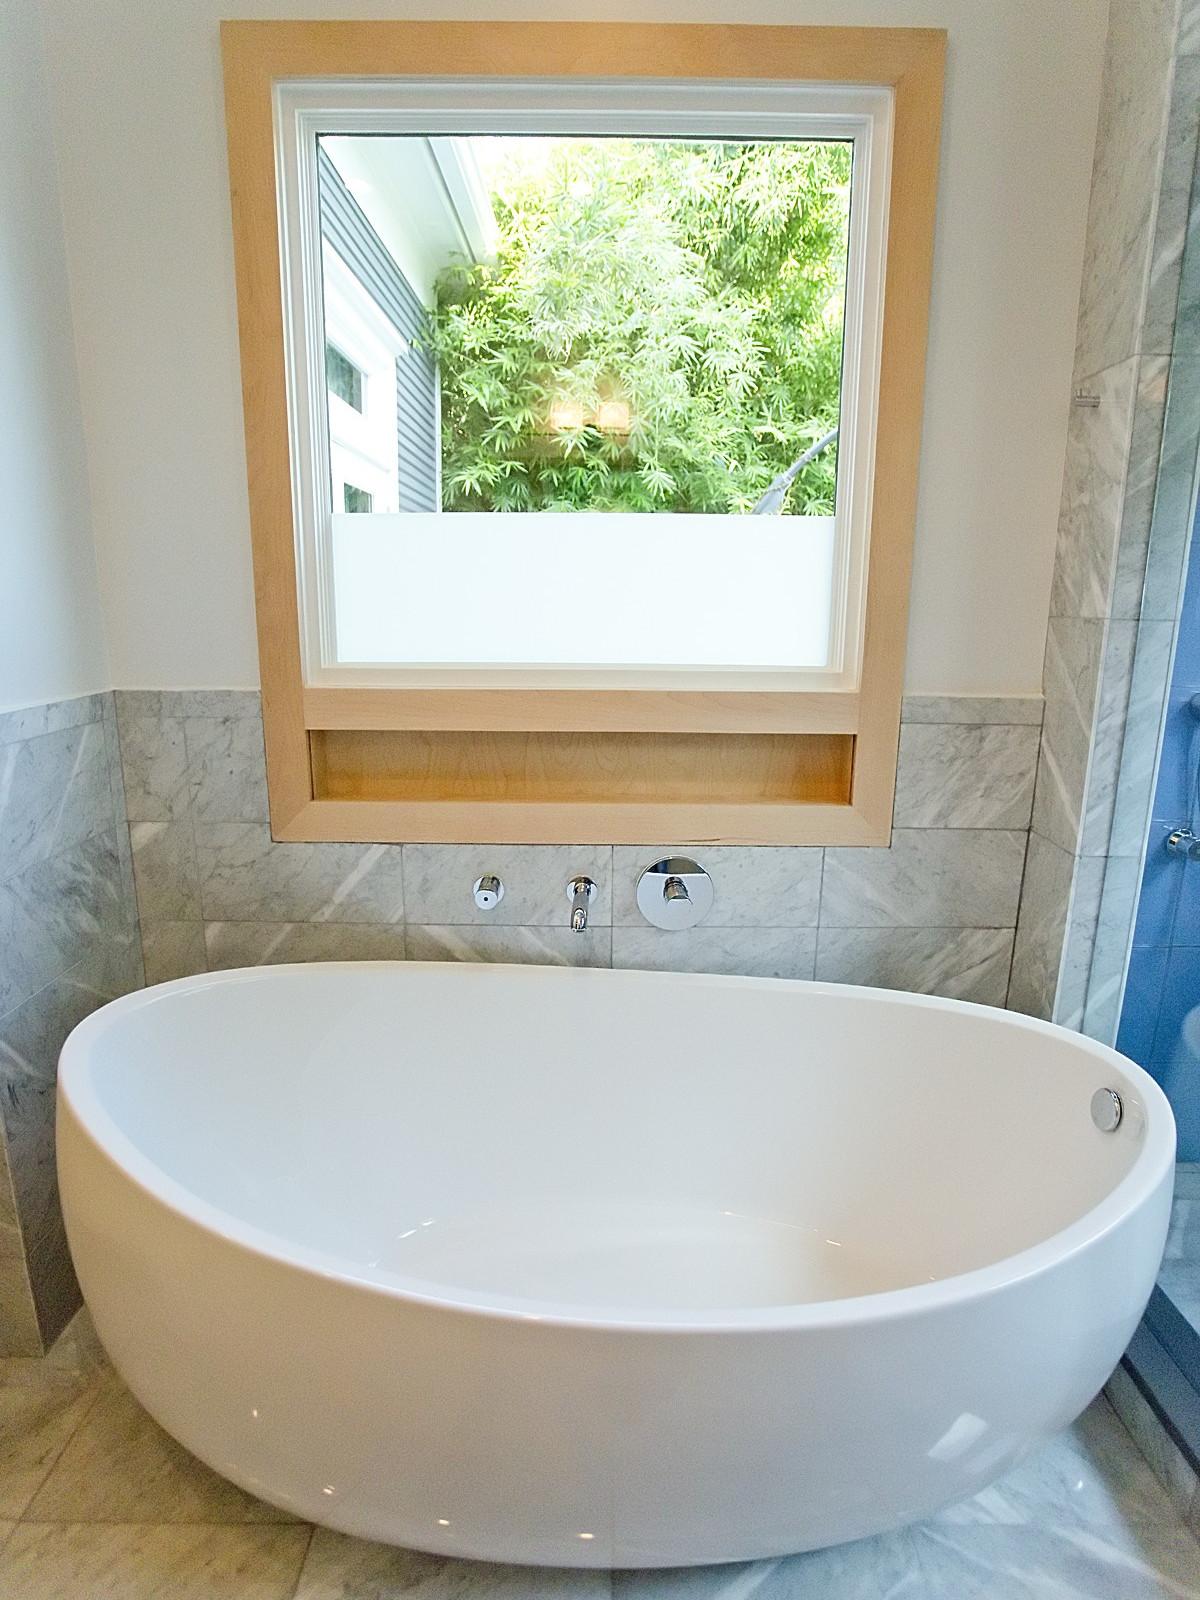 Porch.com Steven Allen Designs bathroom